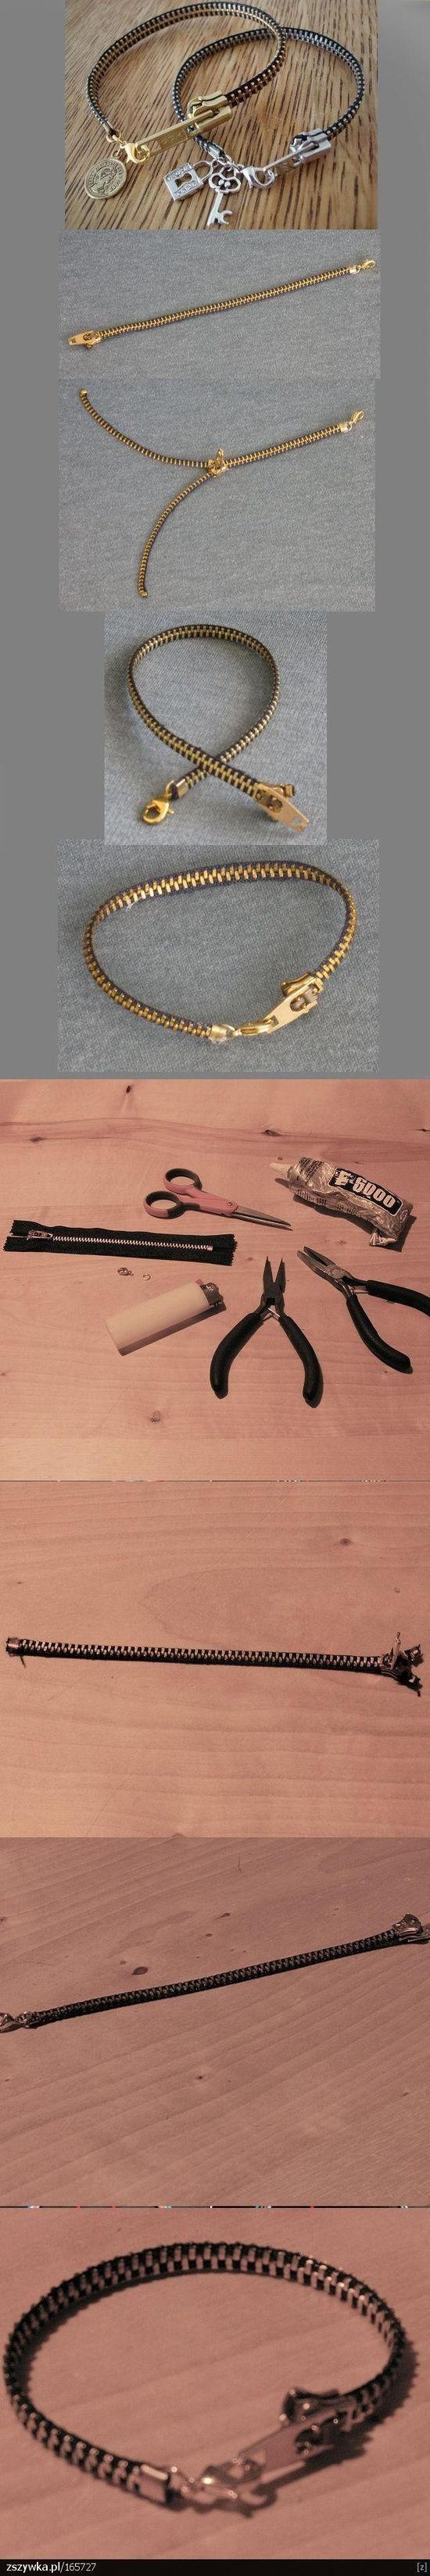 DIY Zipper Bracelet